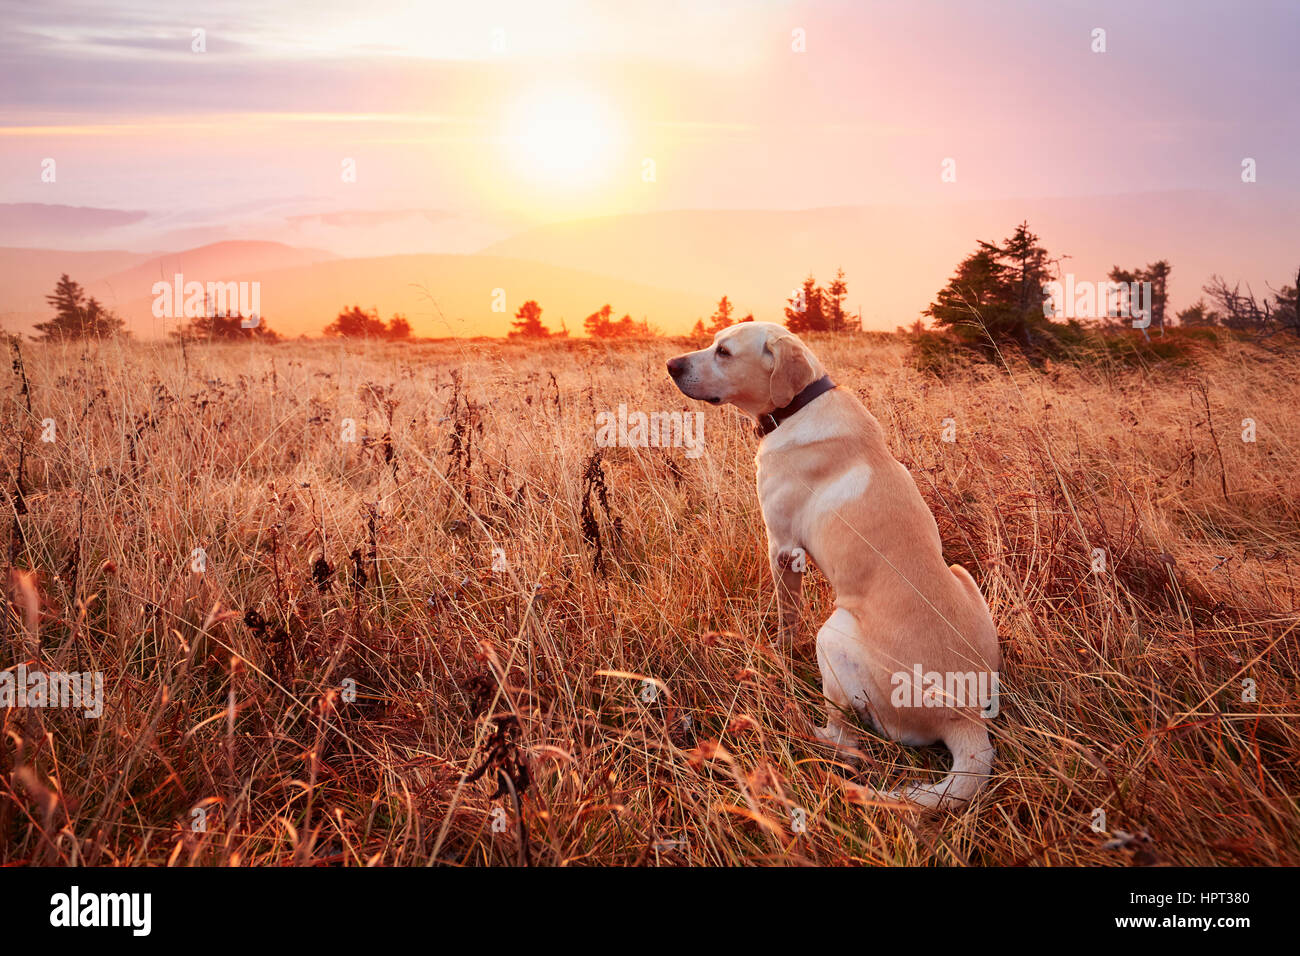 Yellow labrador retriever on the trip in mountains - Stock Image